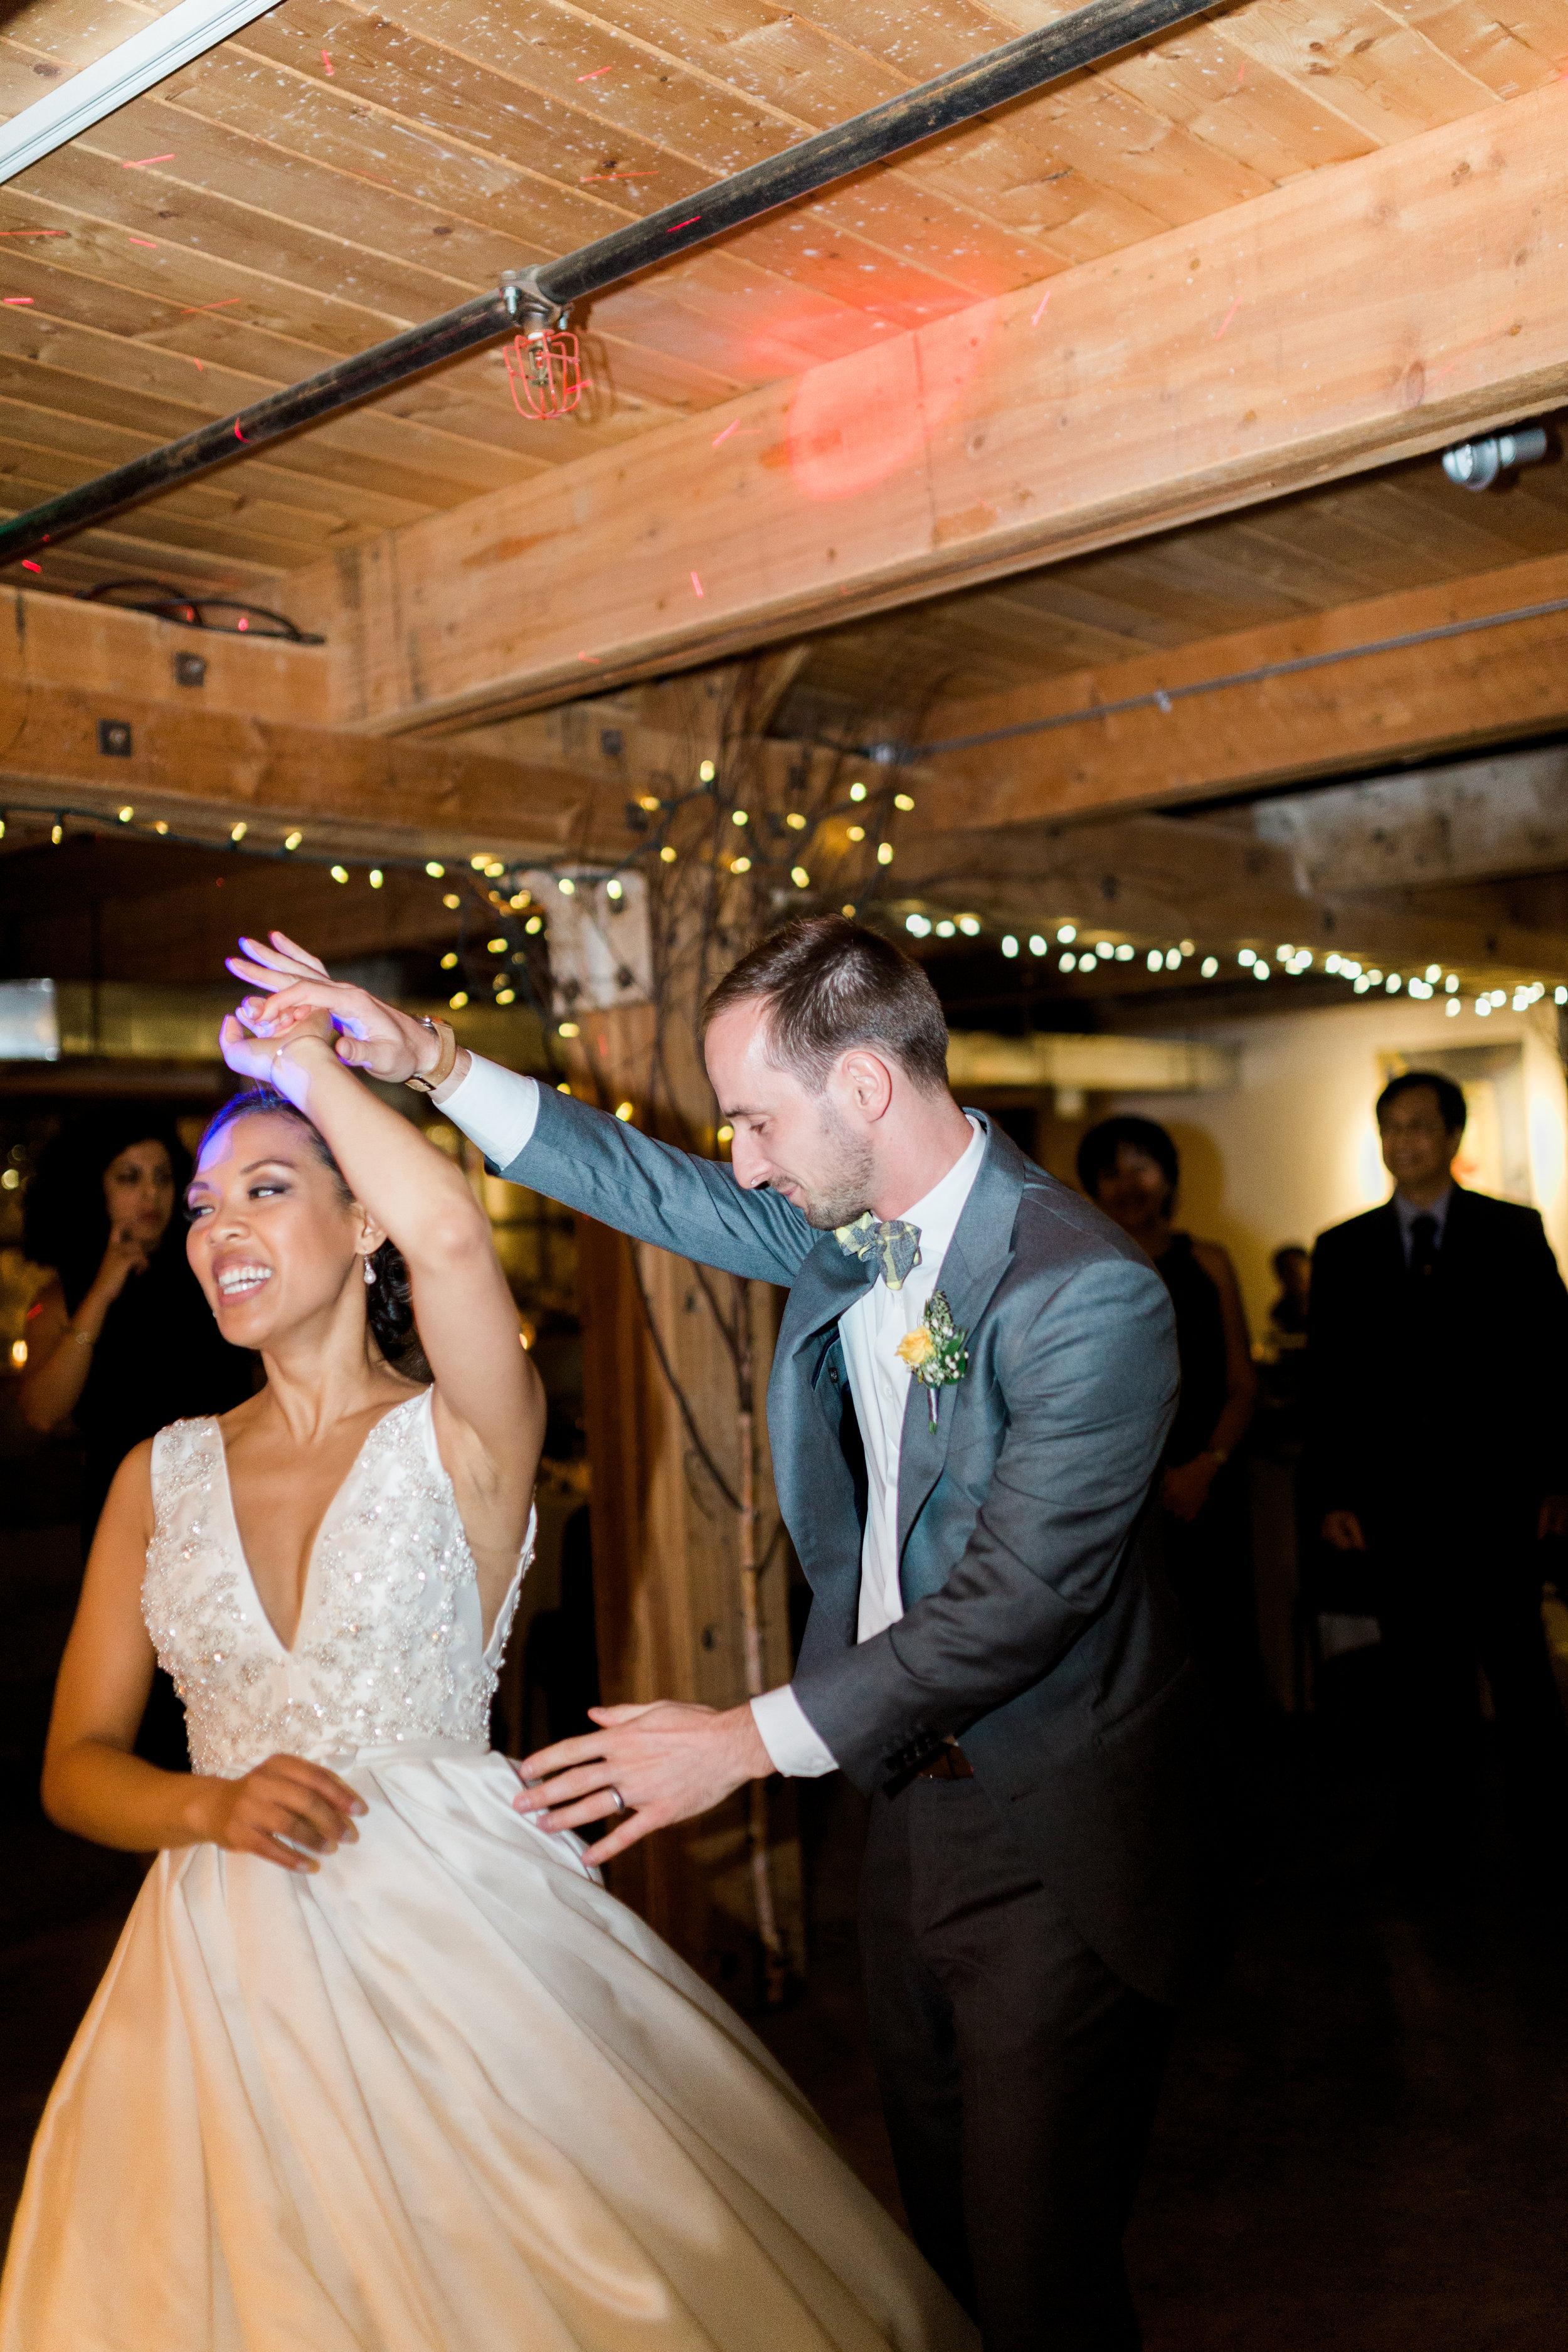 Alton Mills Wedding - Reception-200.jpg